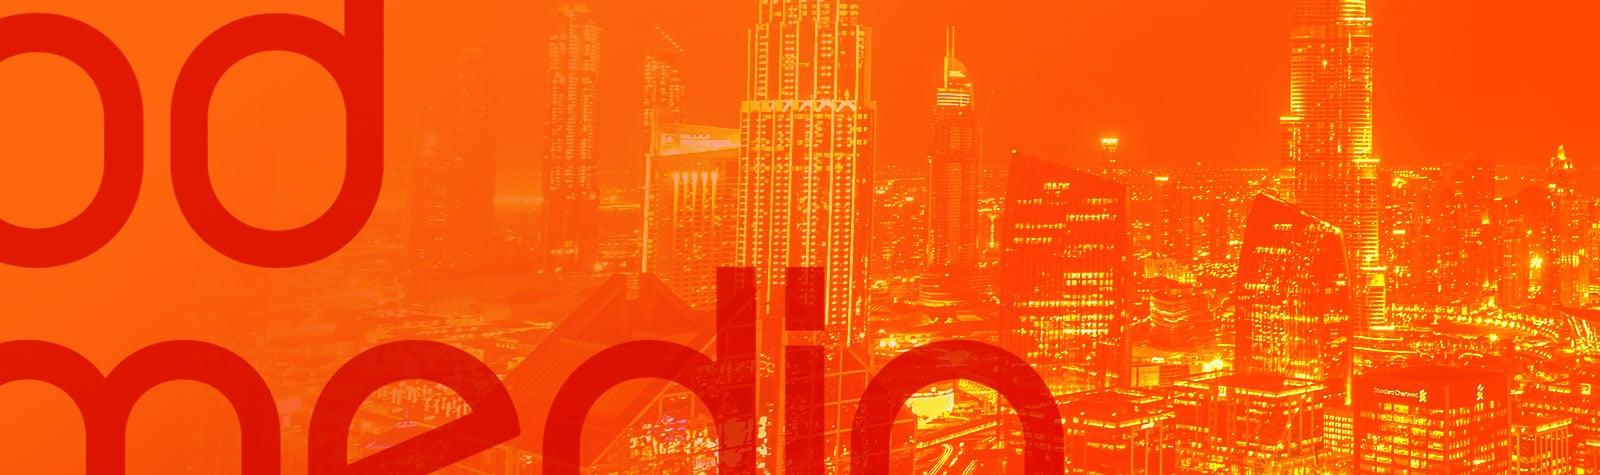 ODMedia announces expansion into the MENA region